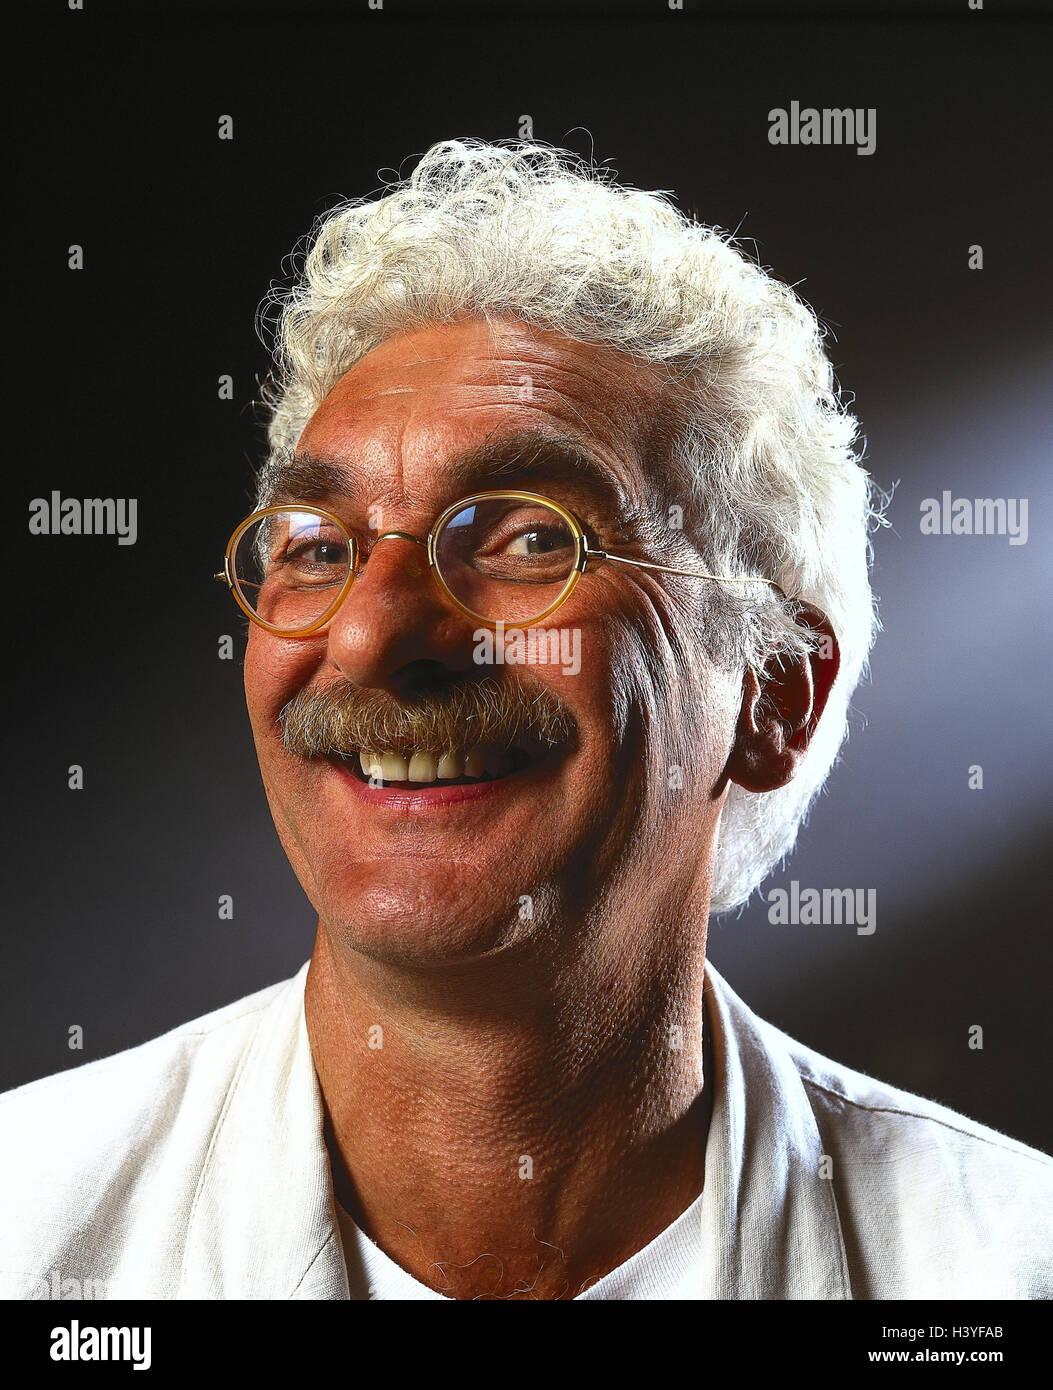 5d20c779ead White Moustache Stock Photos   White Moustache Stock Images - Alamy